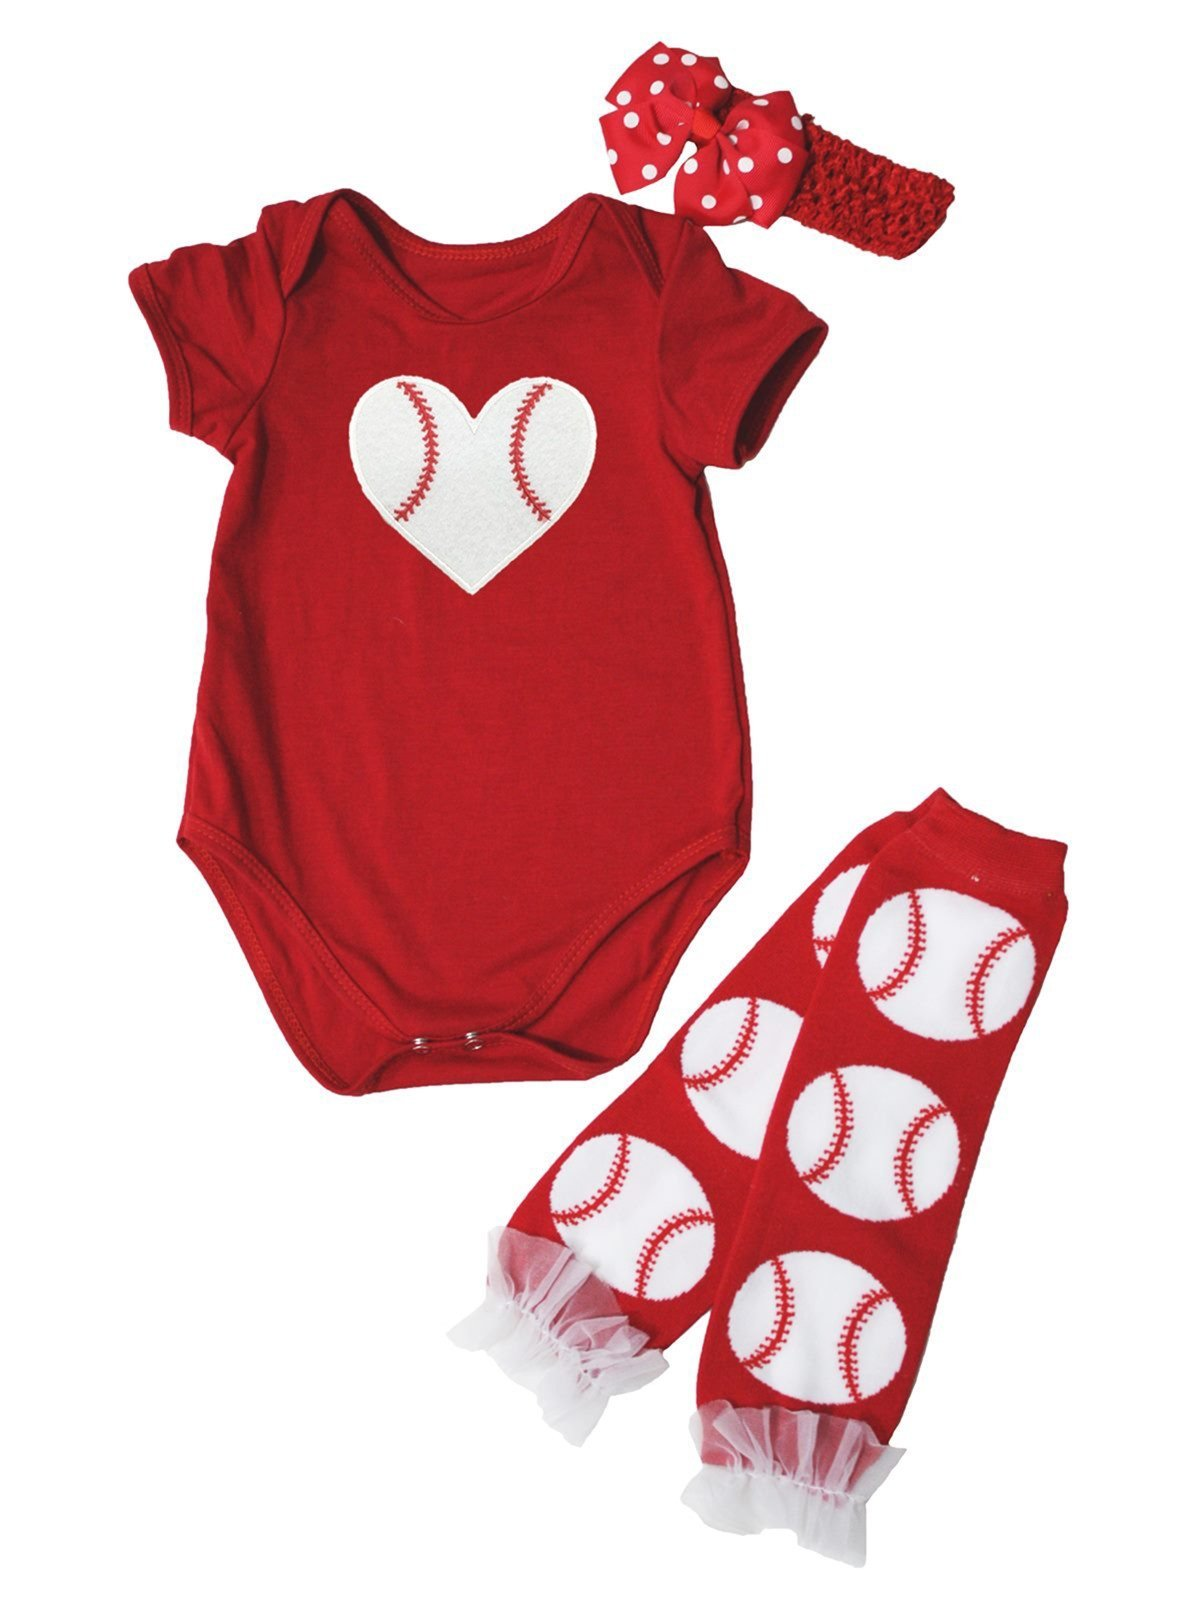 Tianve Newborn Baby Girls Baseball Pompom Rompers Jumpsuit Bodysuit Sunsuit Red